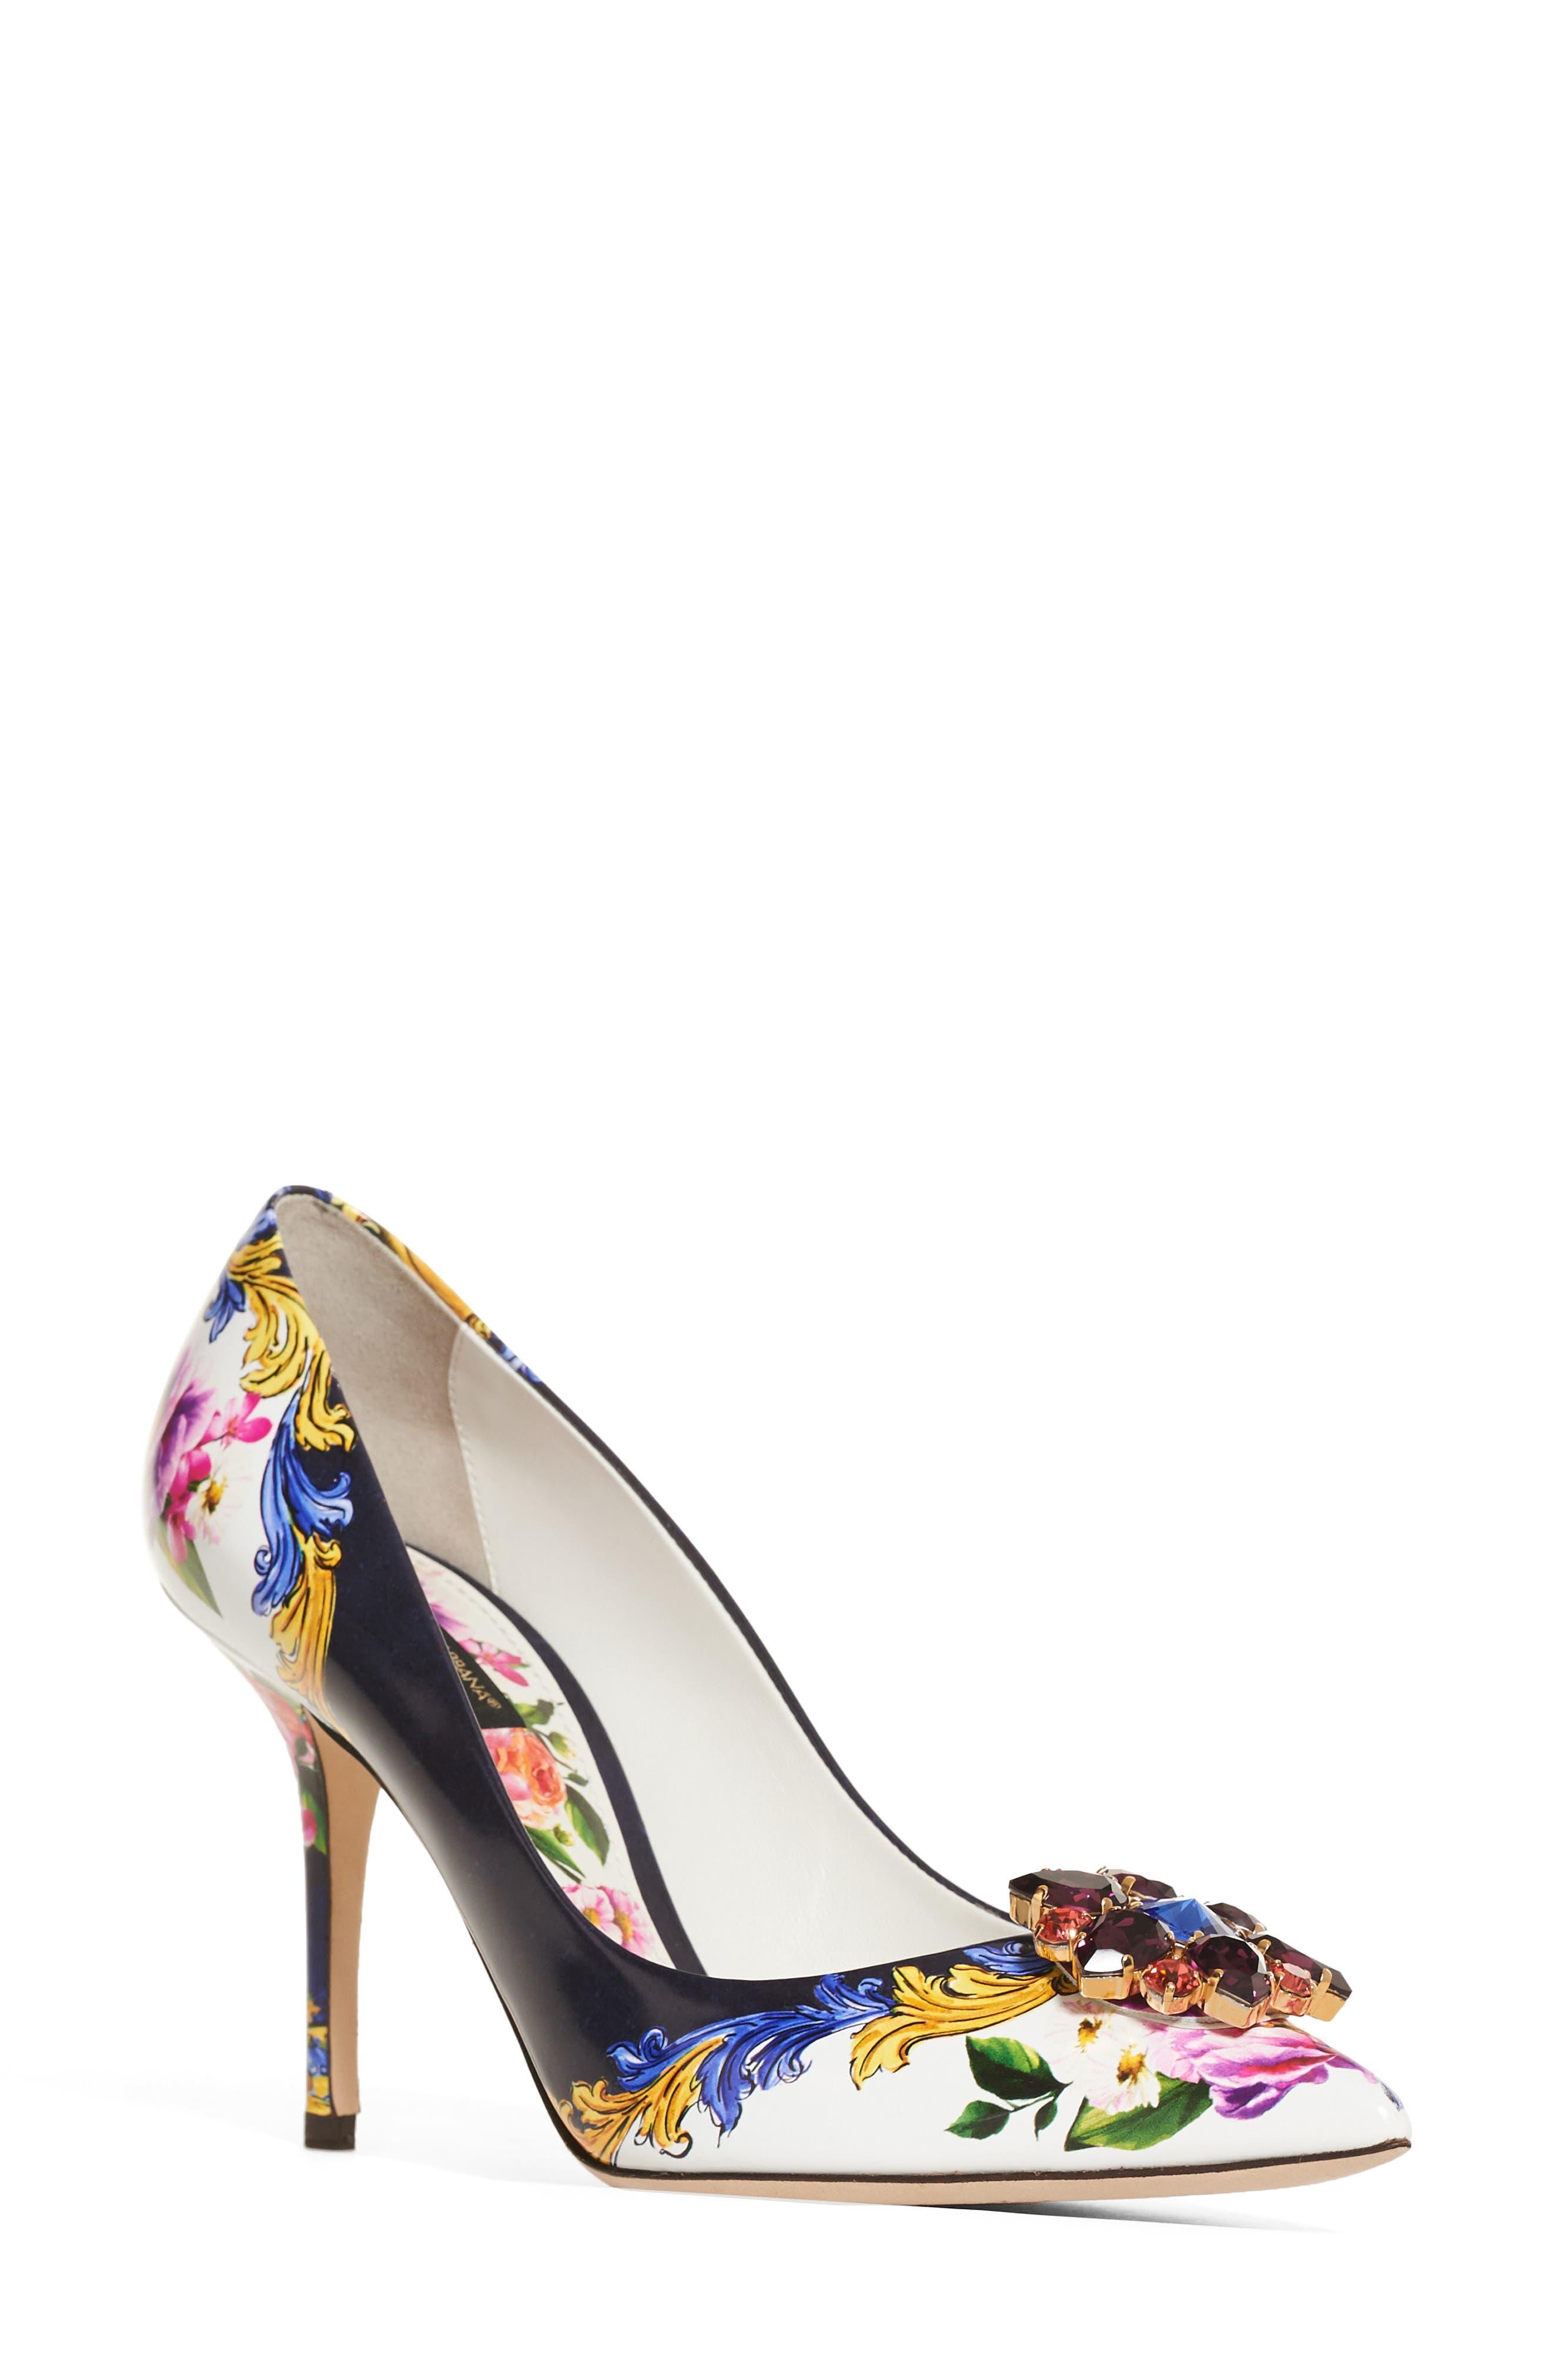 Dolce & Gabbana Print Pump,                             Main thumbnail 1, color,                             410